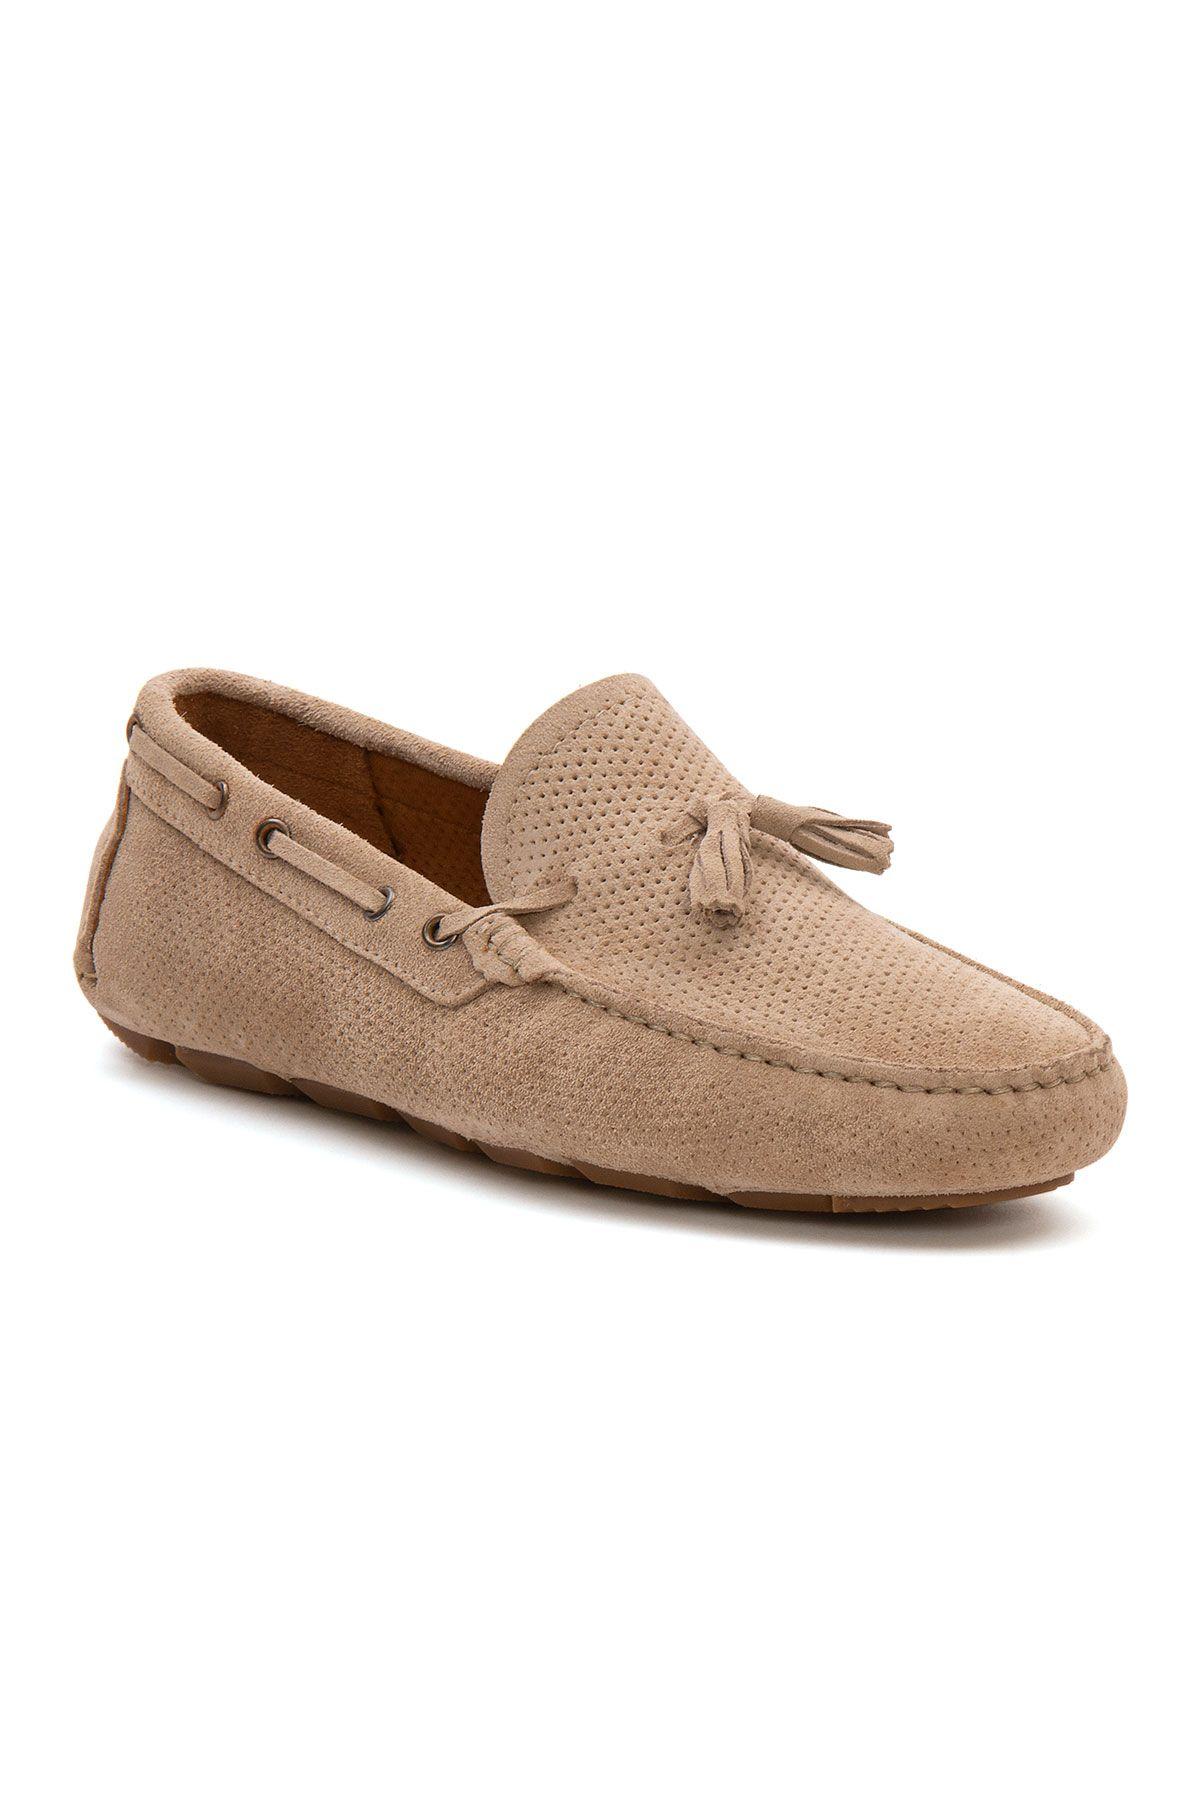 Pegia Genuine Suede Men's Tassel Loafer 500903 Beige